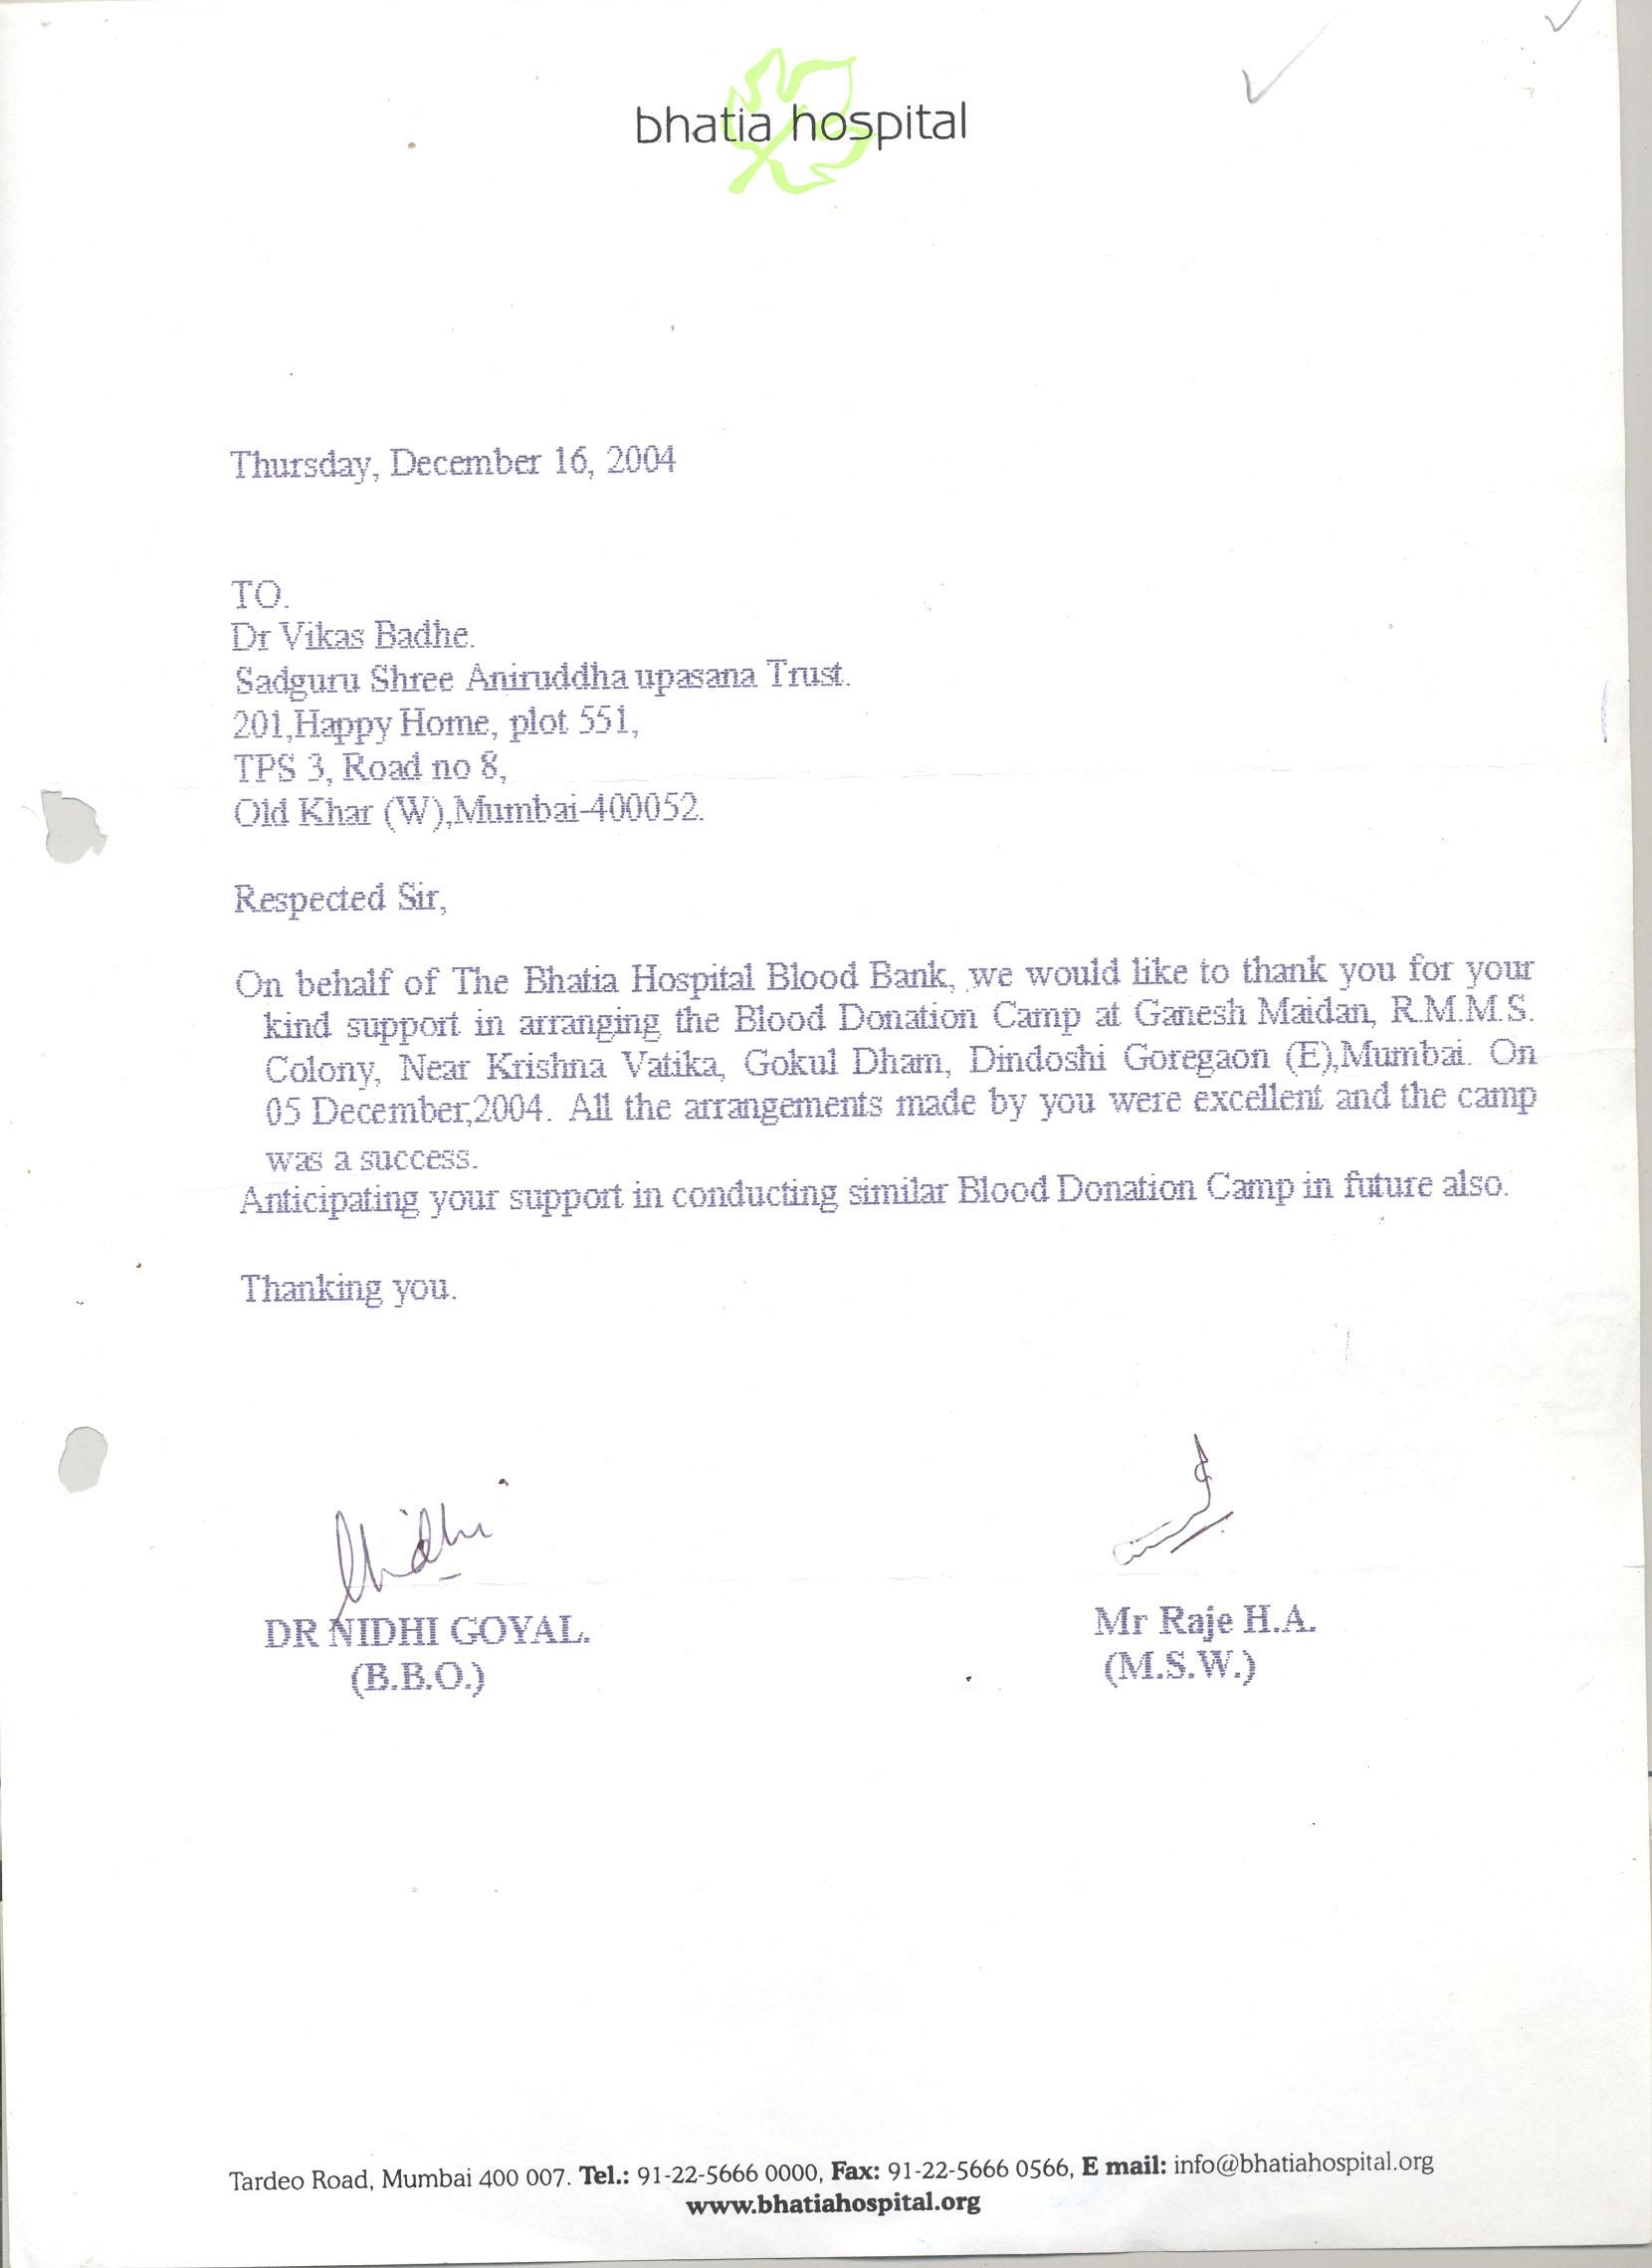 appreciation letter blood donation camps shree aniruddha upasana appreciation letter from bhatia hospital 2004 for compassion social